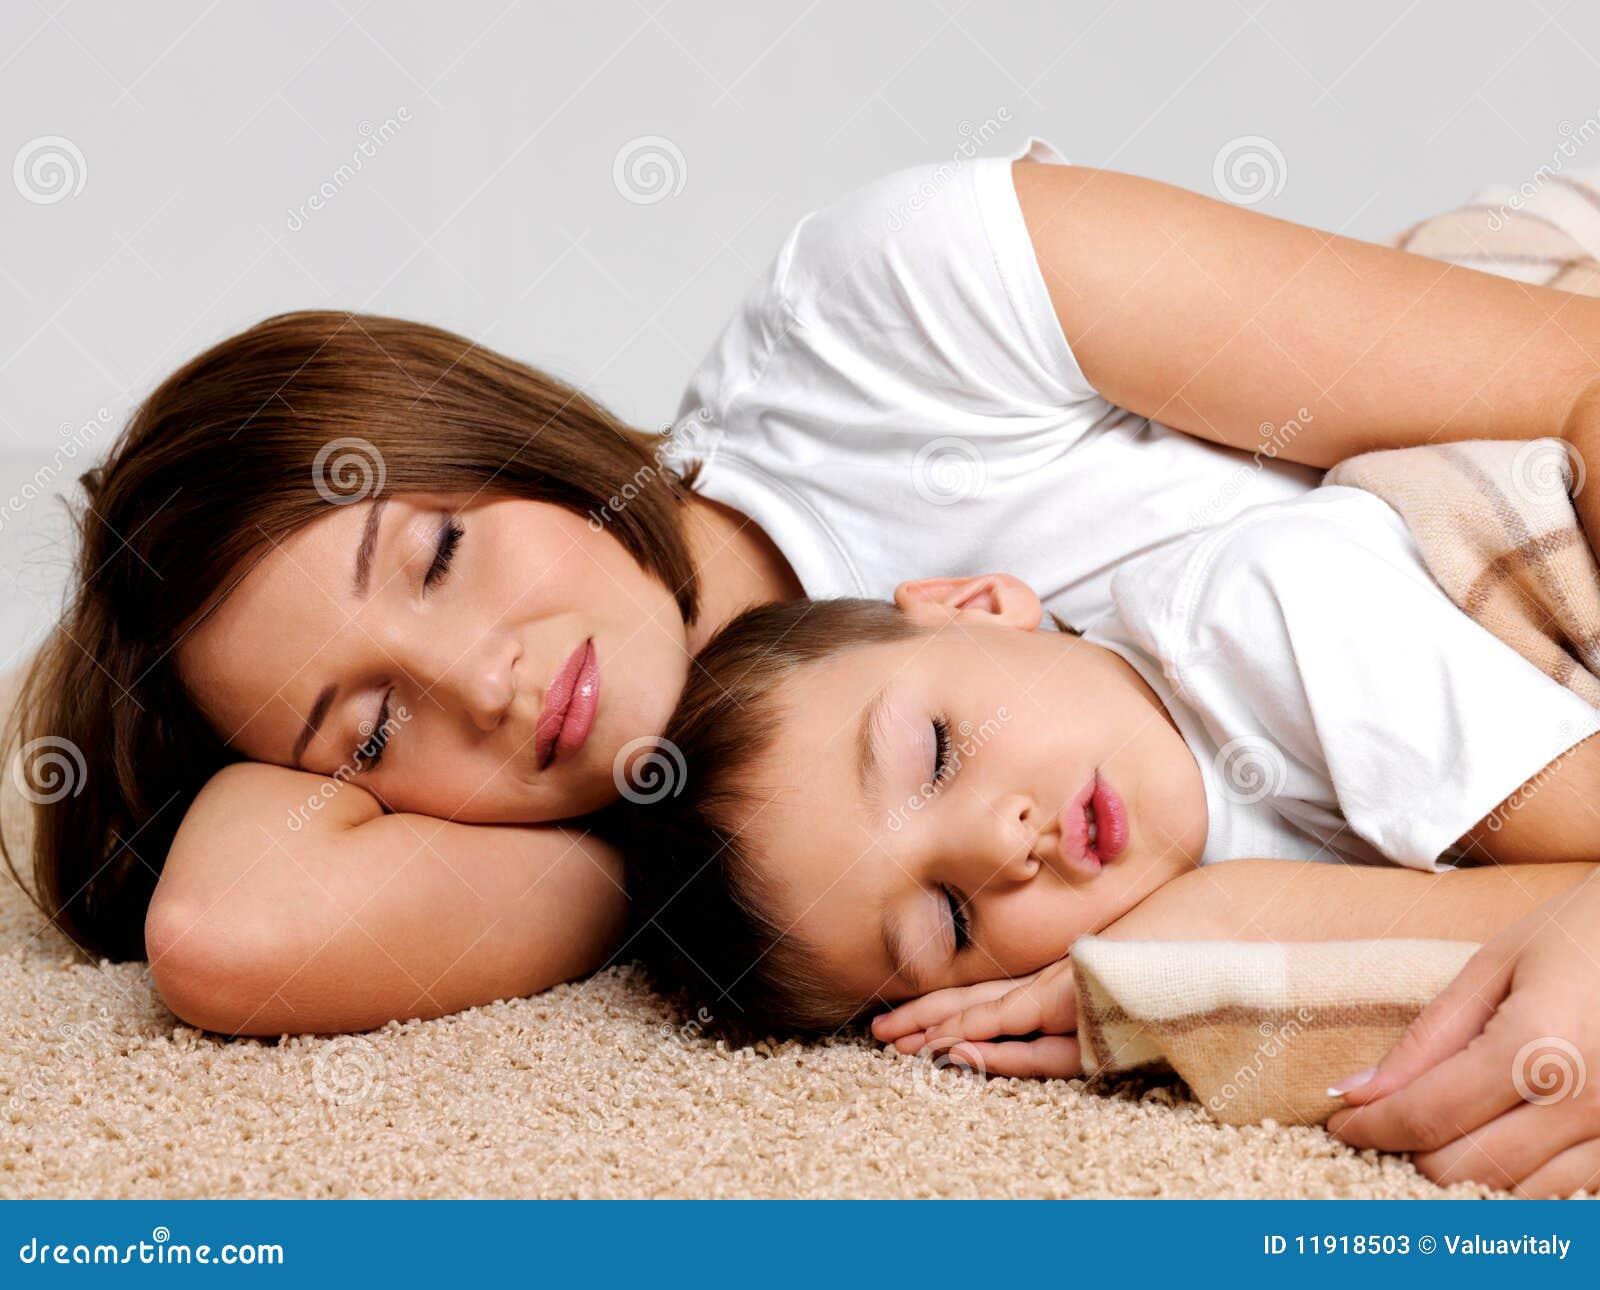 Спящая мать фото 4 фотография